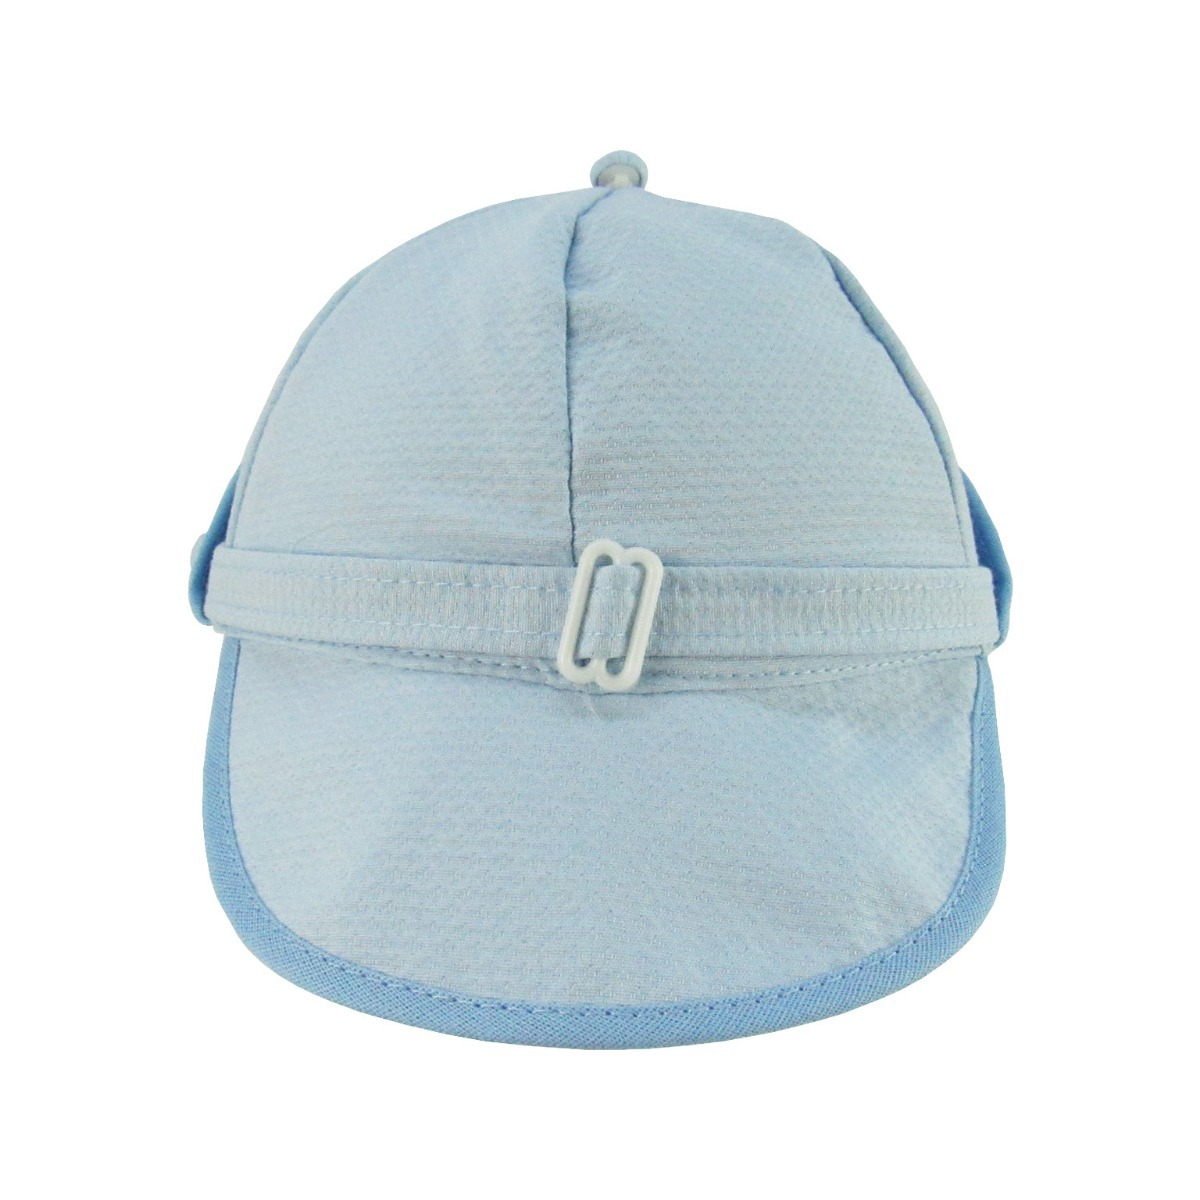 54304fae87aa3 boné bebê masculino azul claro. Carregando zoom.